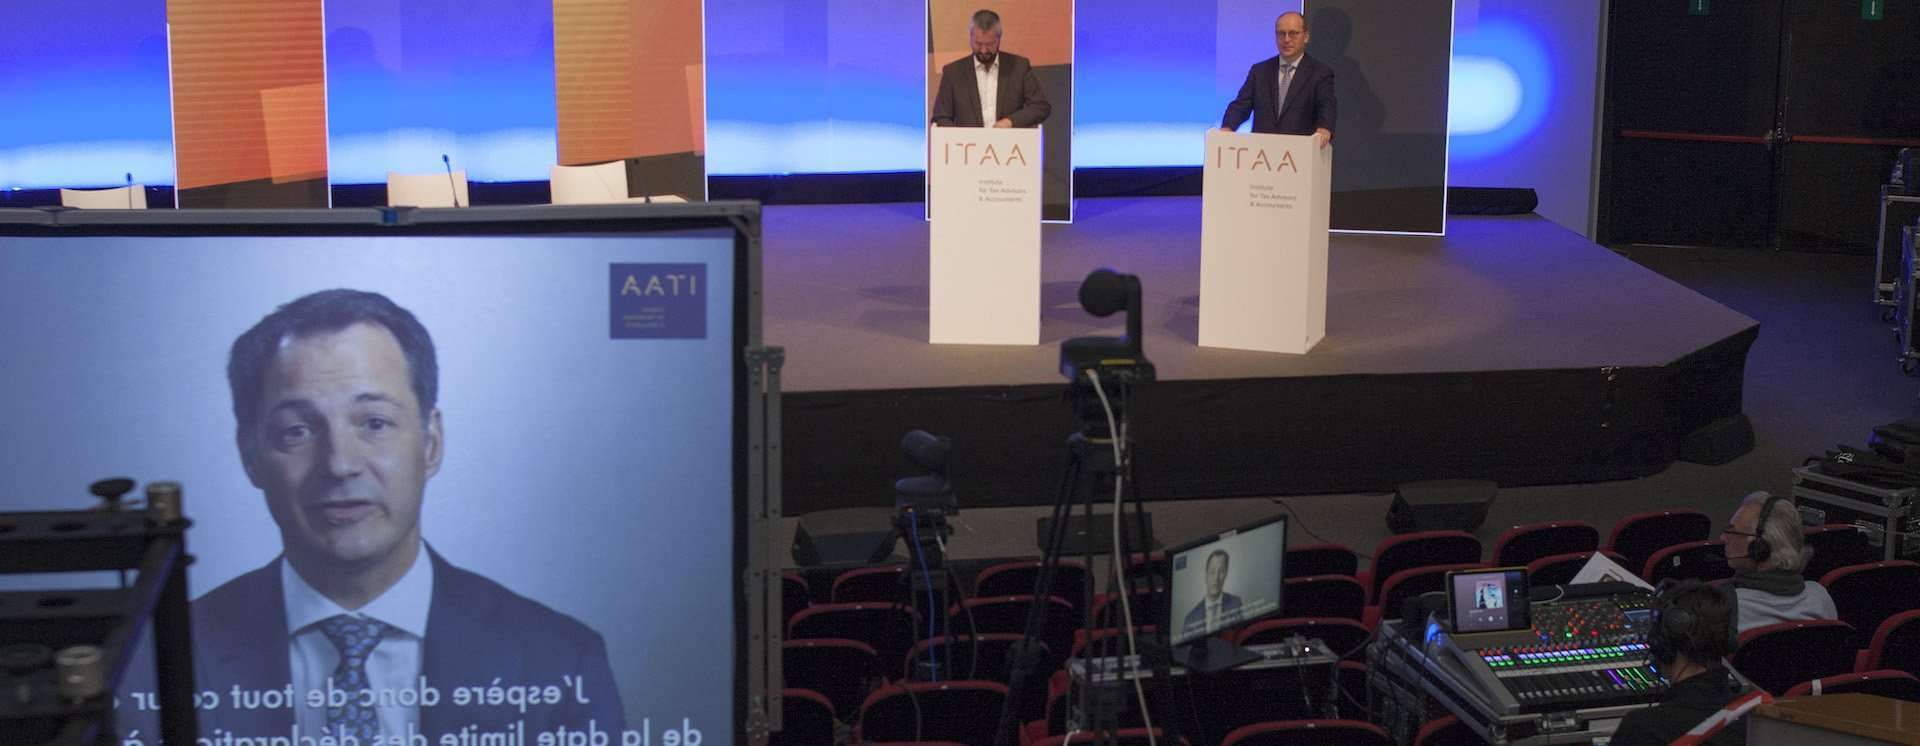 ITAA the Institute for Tax Advisors & Accountants